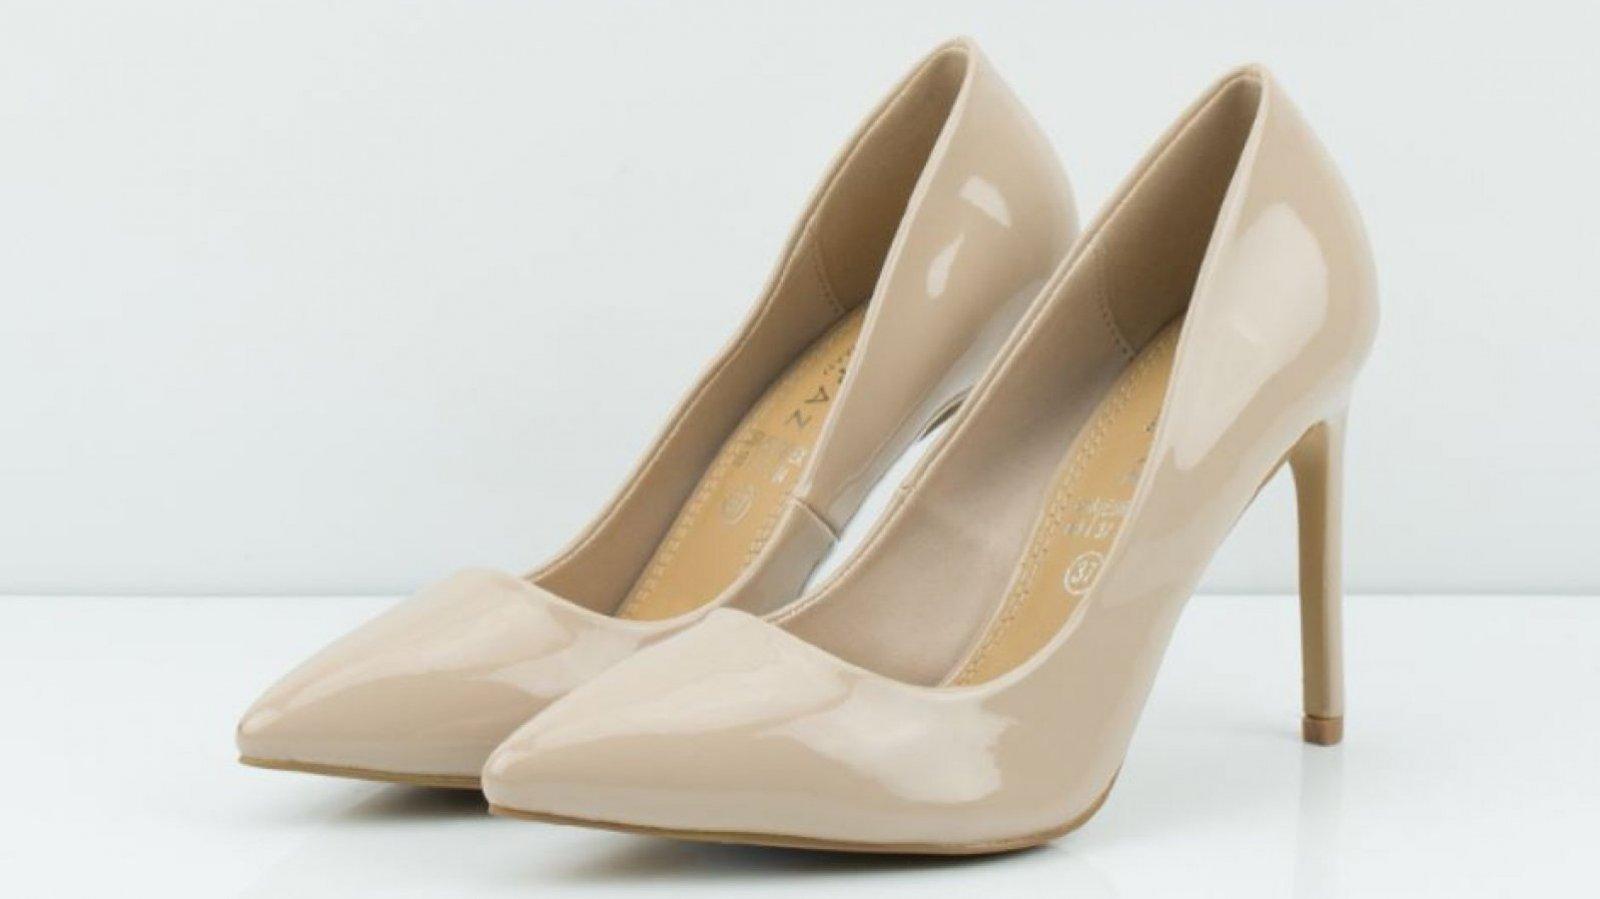 Zapatos de tacón charol beige de Marypaz, por 19,95 euros